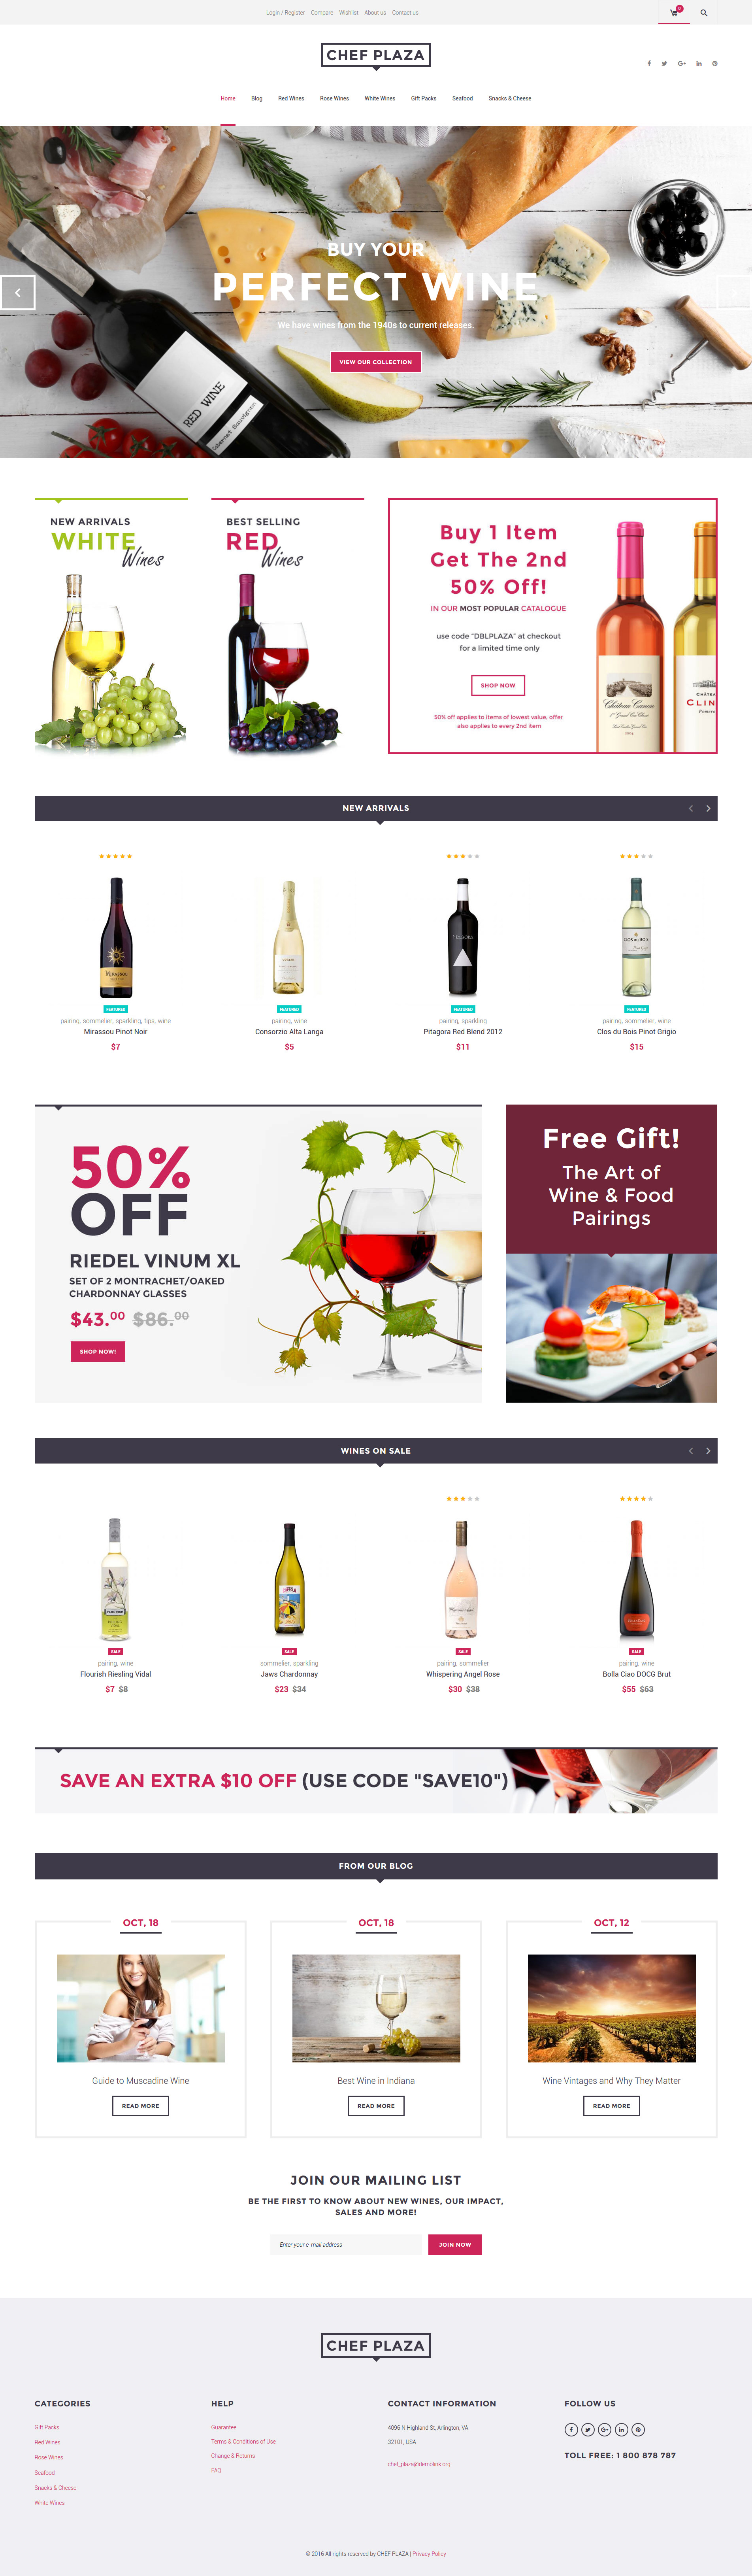 Responsivt Chef Plaza Food And Wine Store WooCommerce-tema #61302